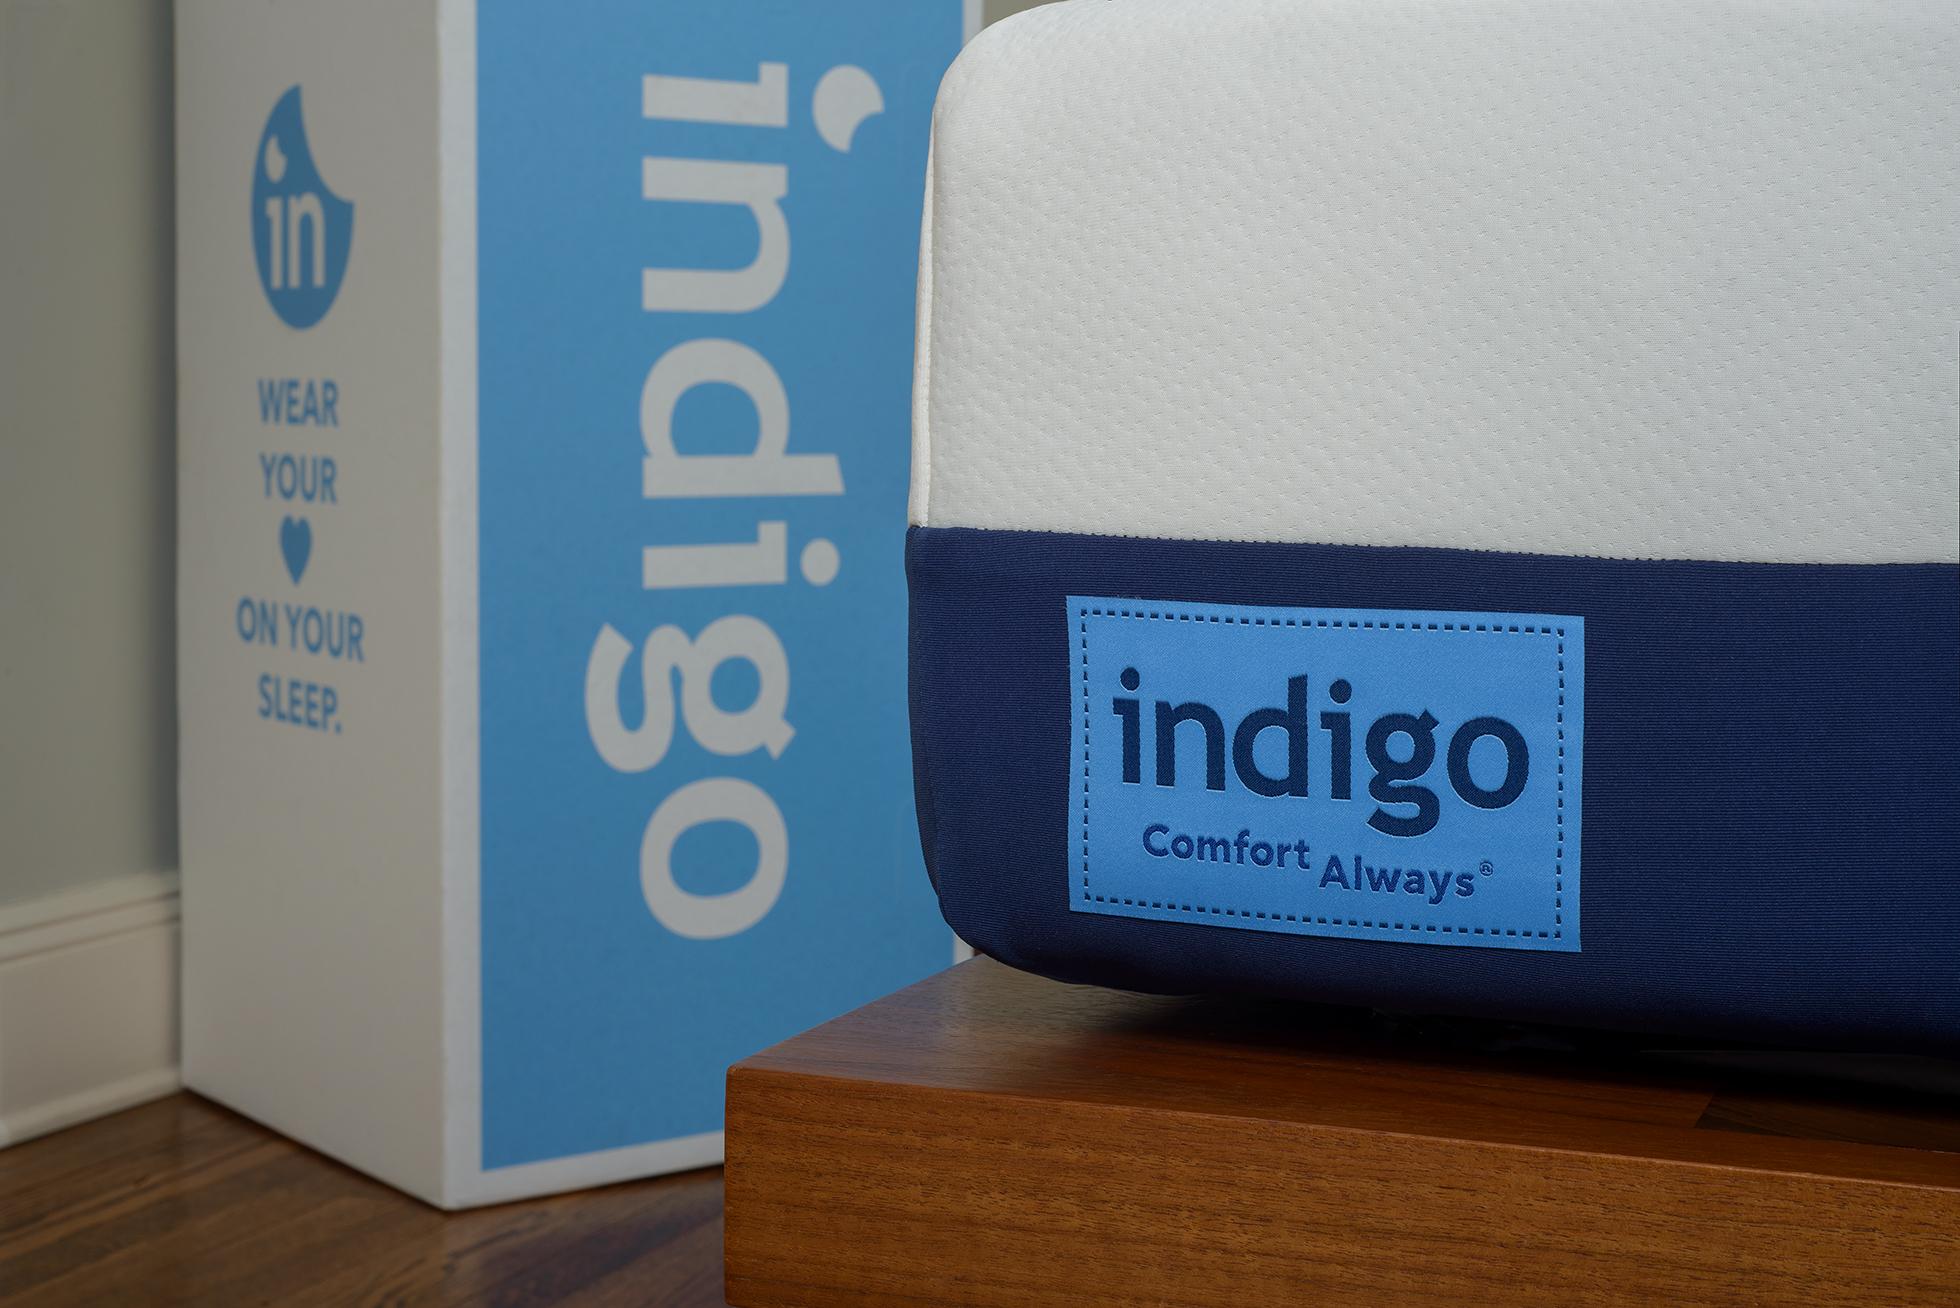 Indigo-072_web.jpg